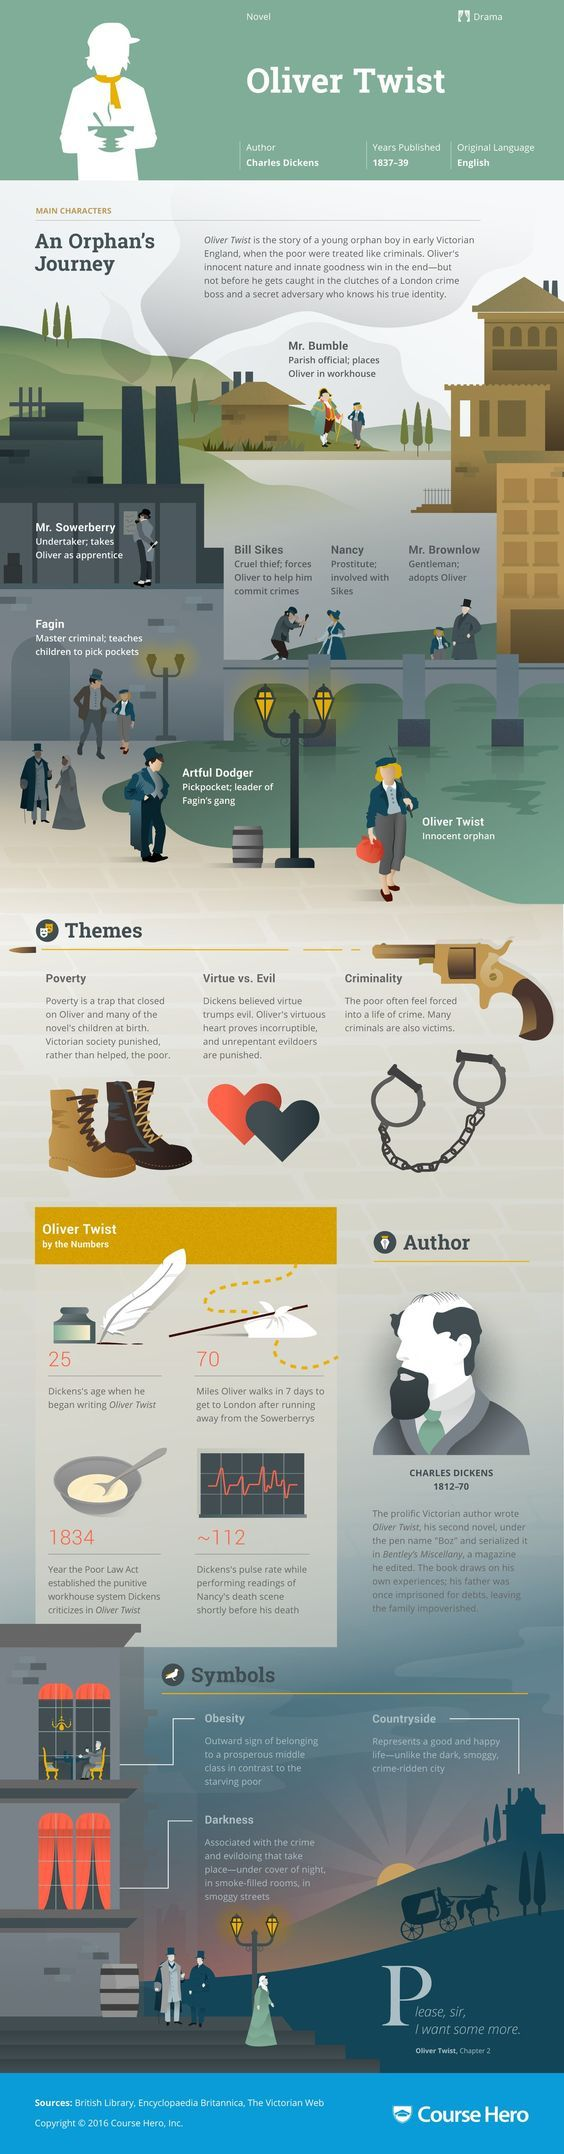 Oliver Twist Infographic   Course Hero: